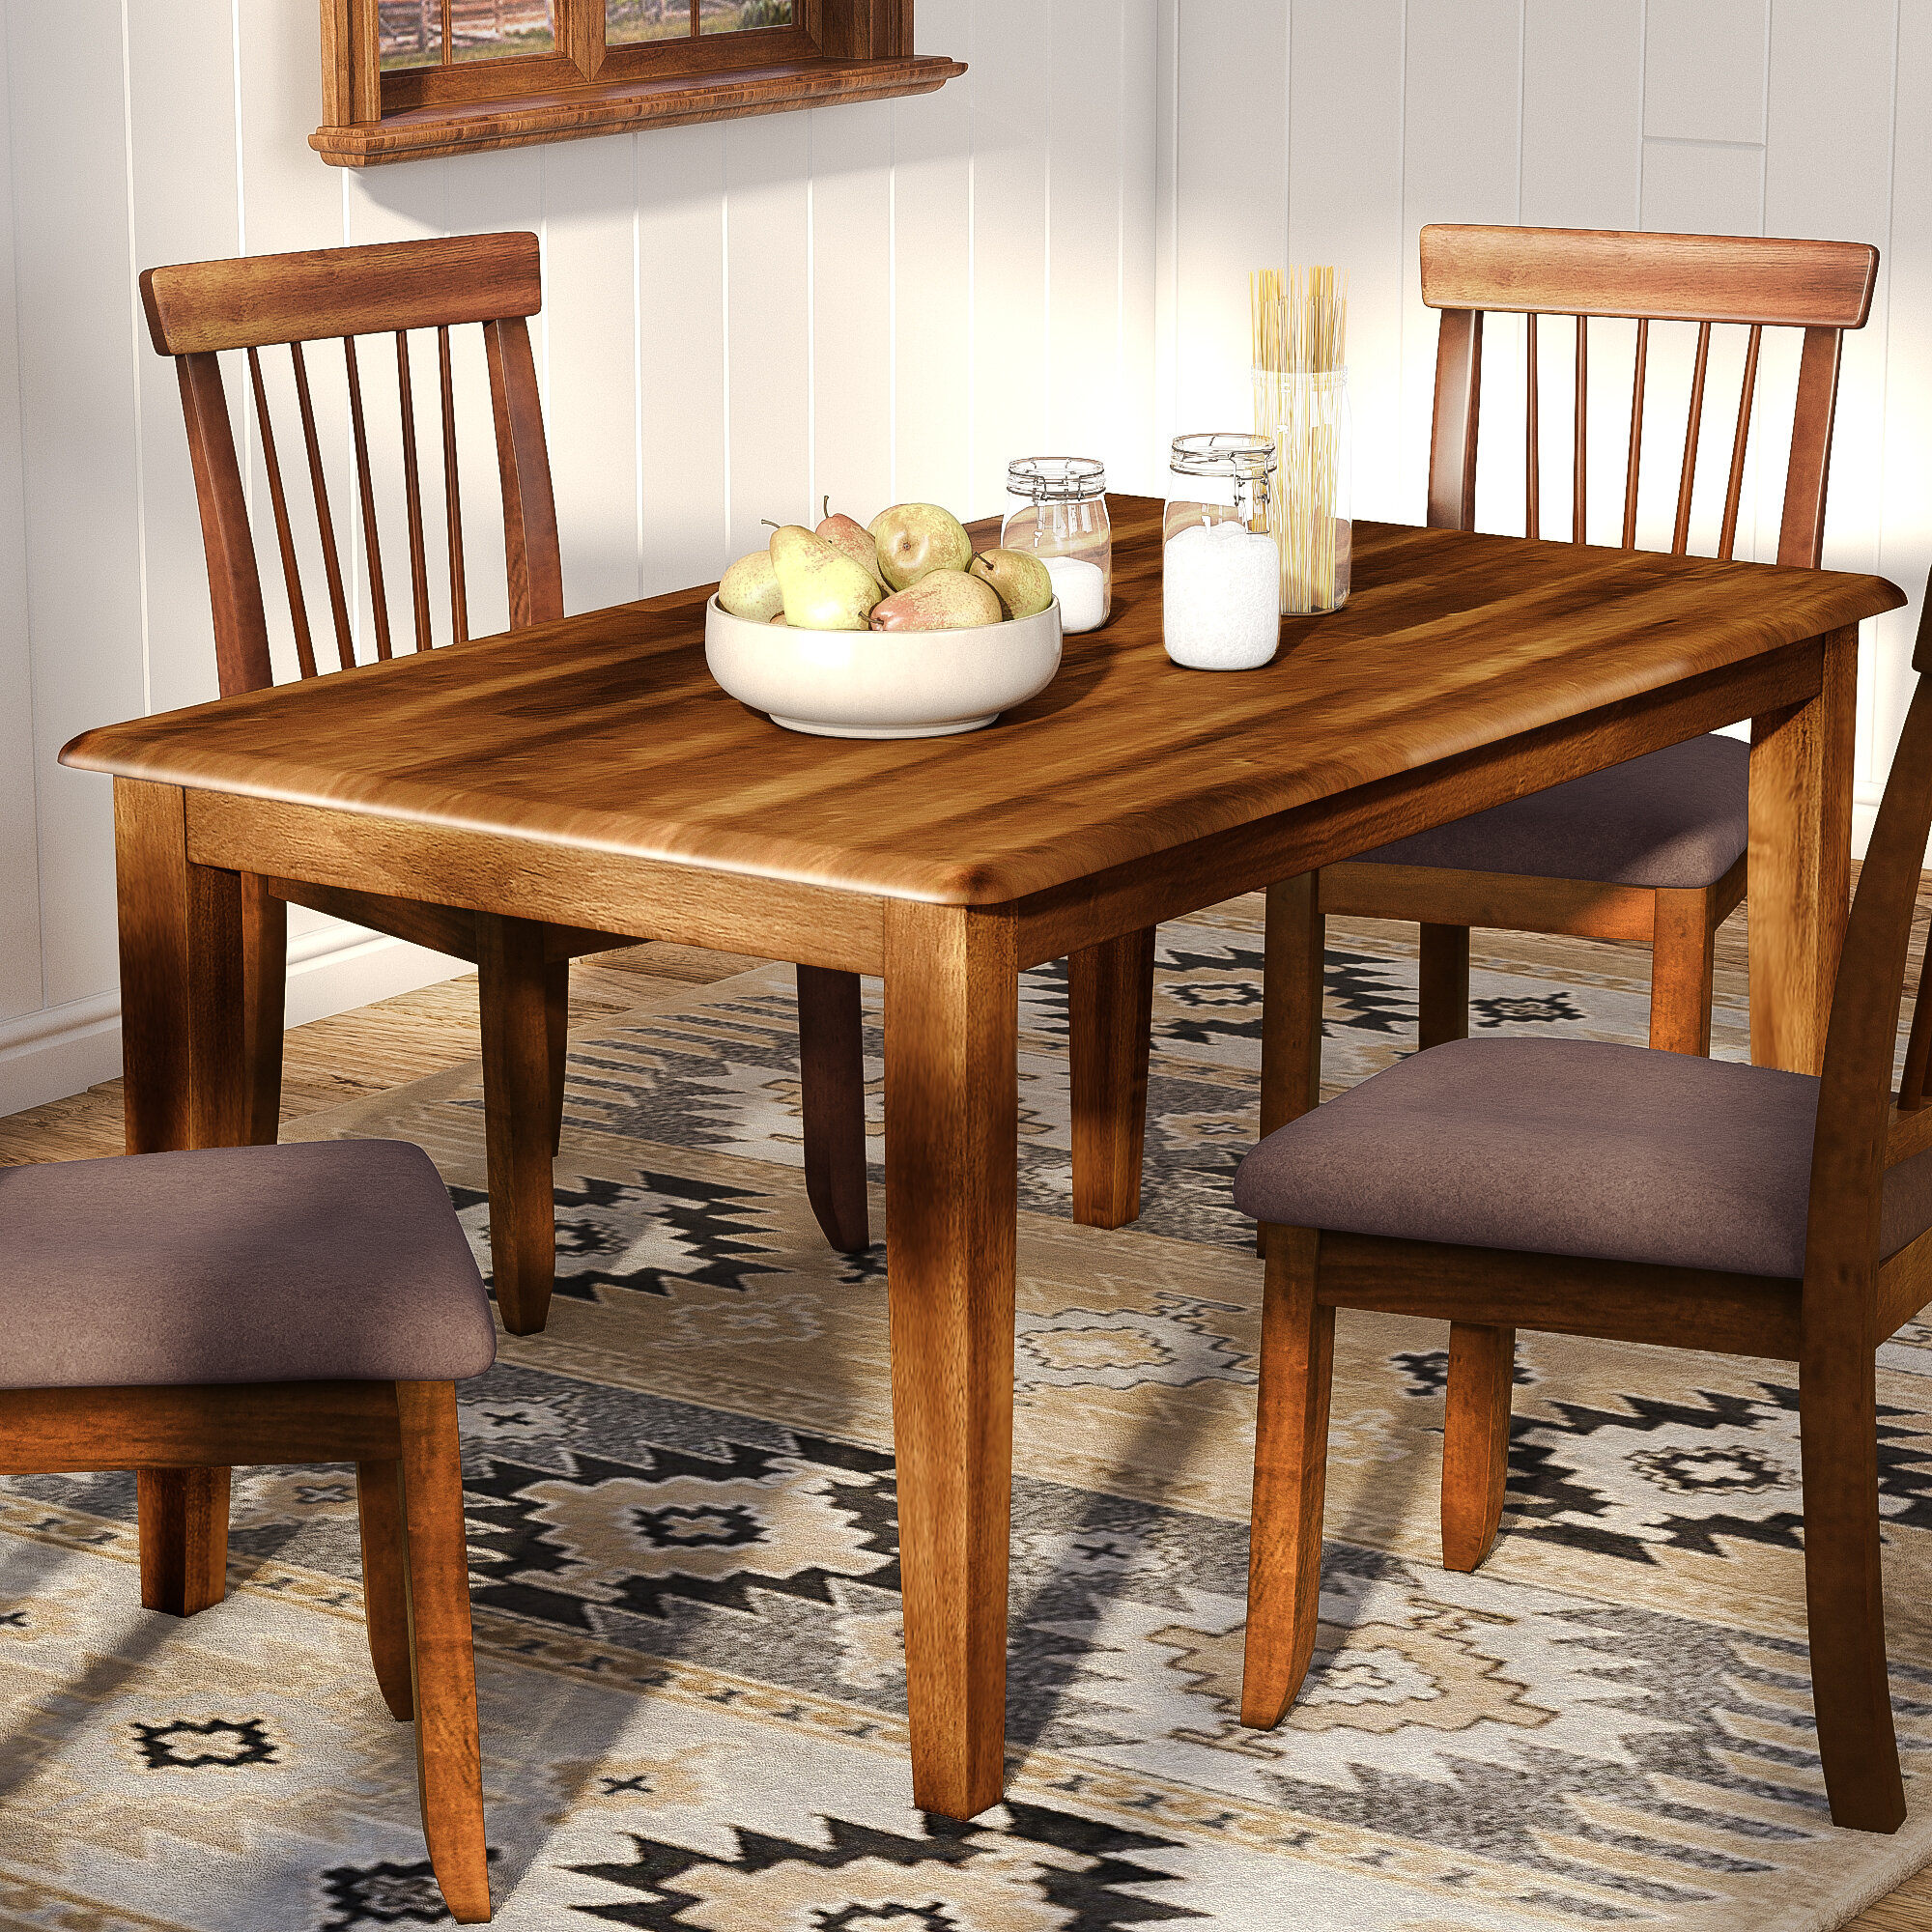 Loon Peak Kaiser Point Dining Table & Reviews | Wayfair